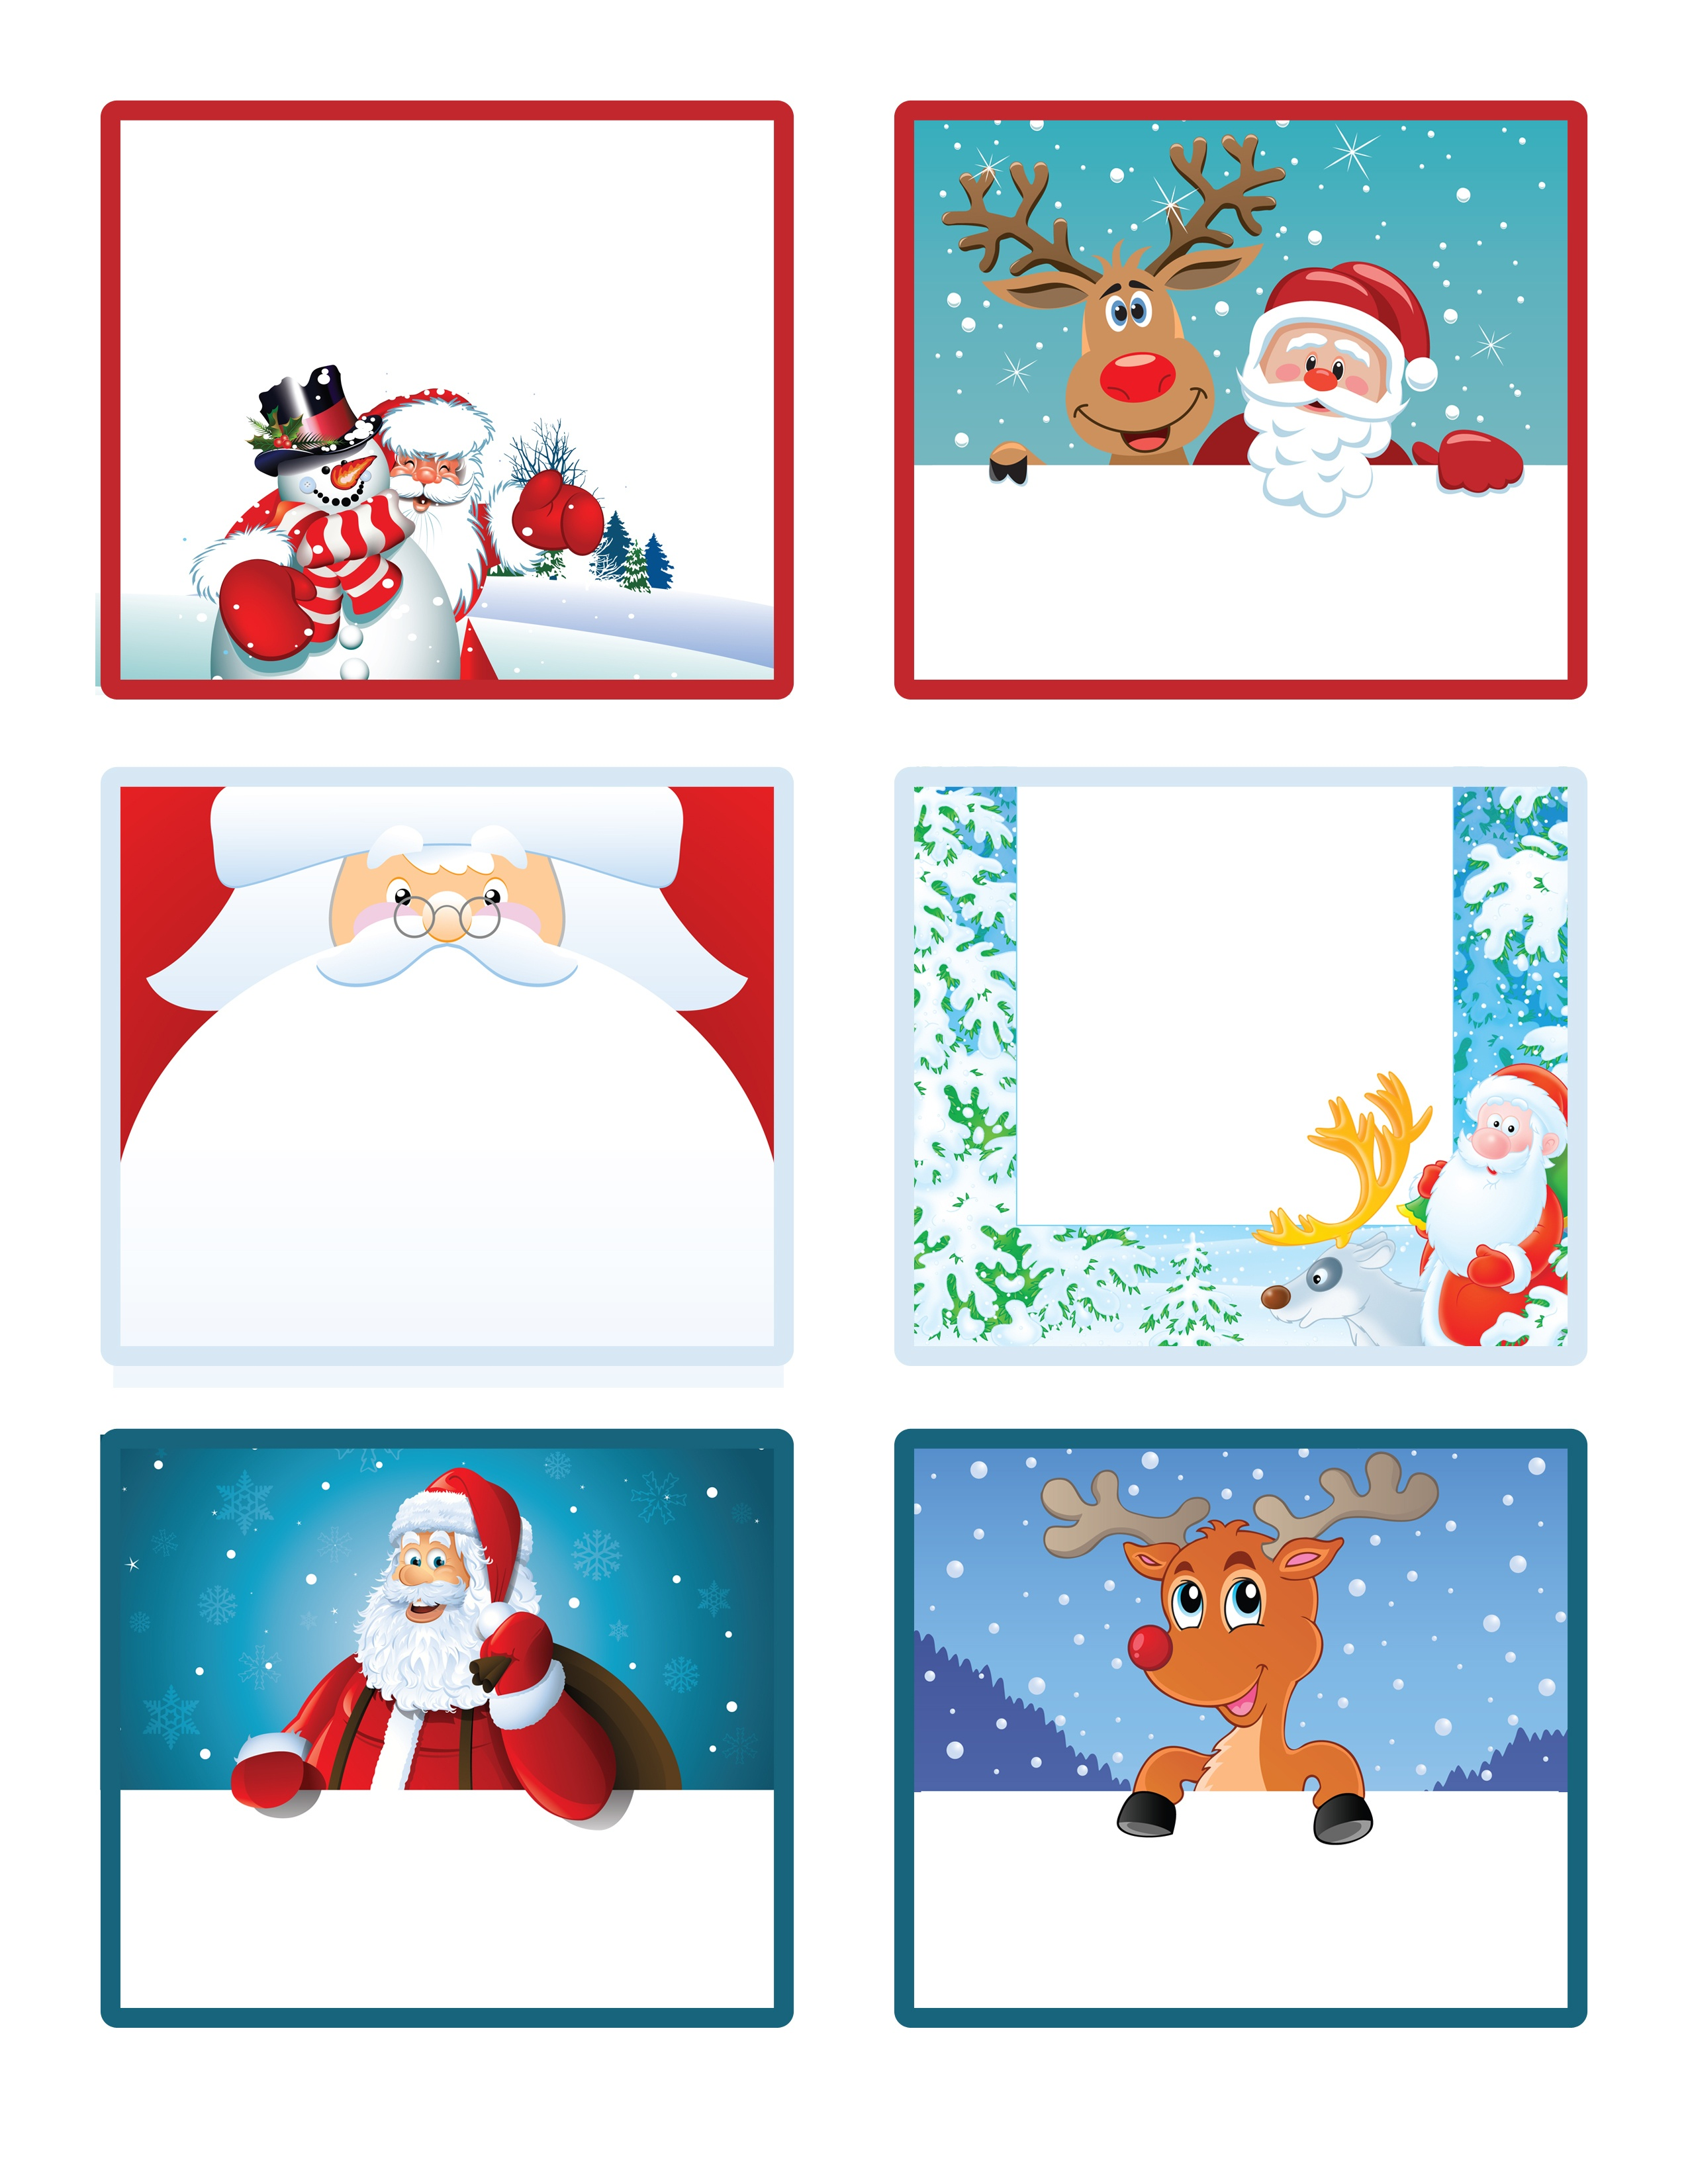 Santa's Little Gift To You! Free Printable Gift Tags And Labels - Free Printable Holiday Labels